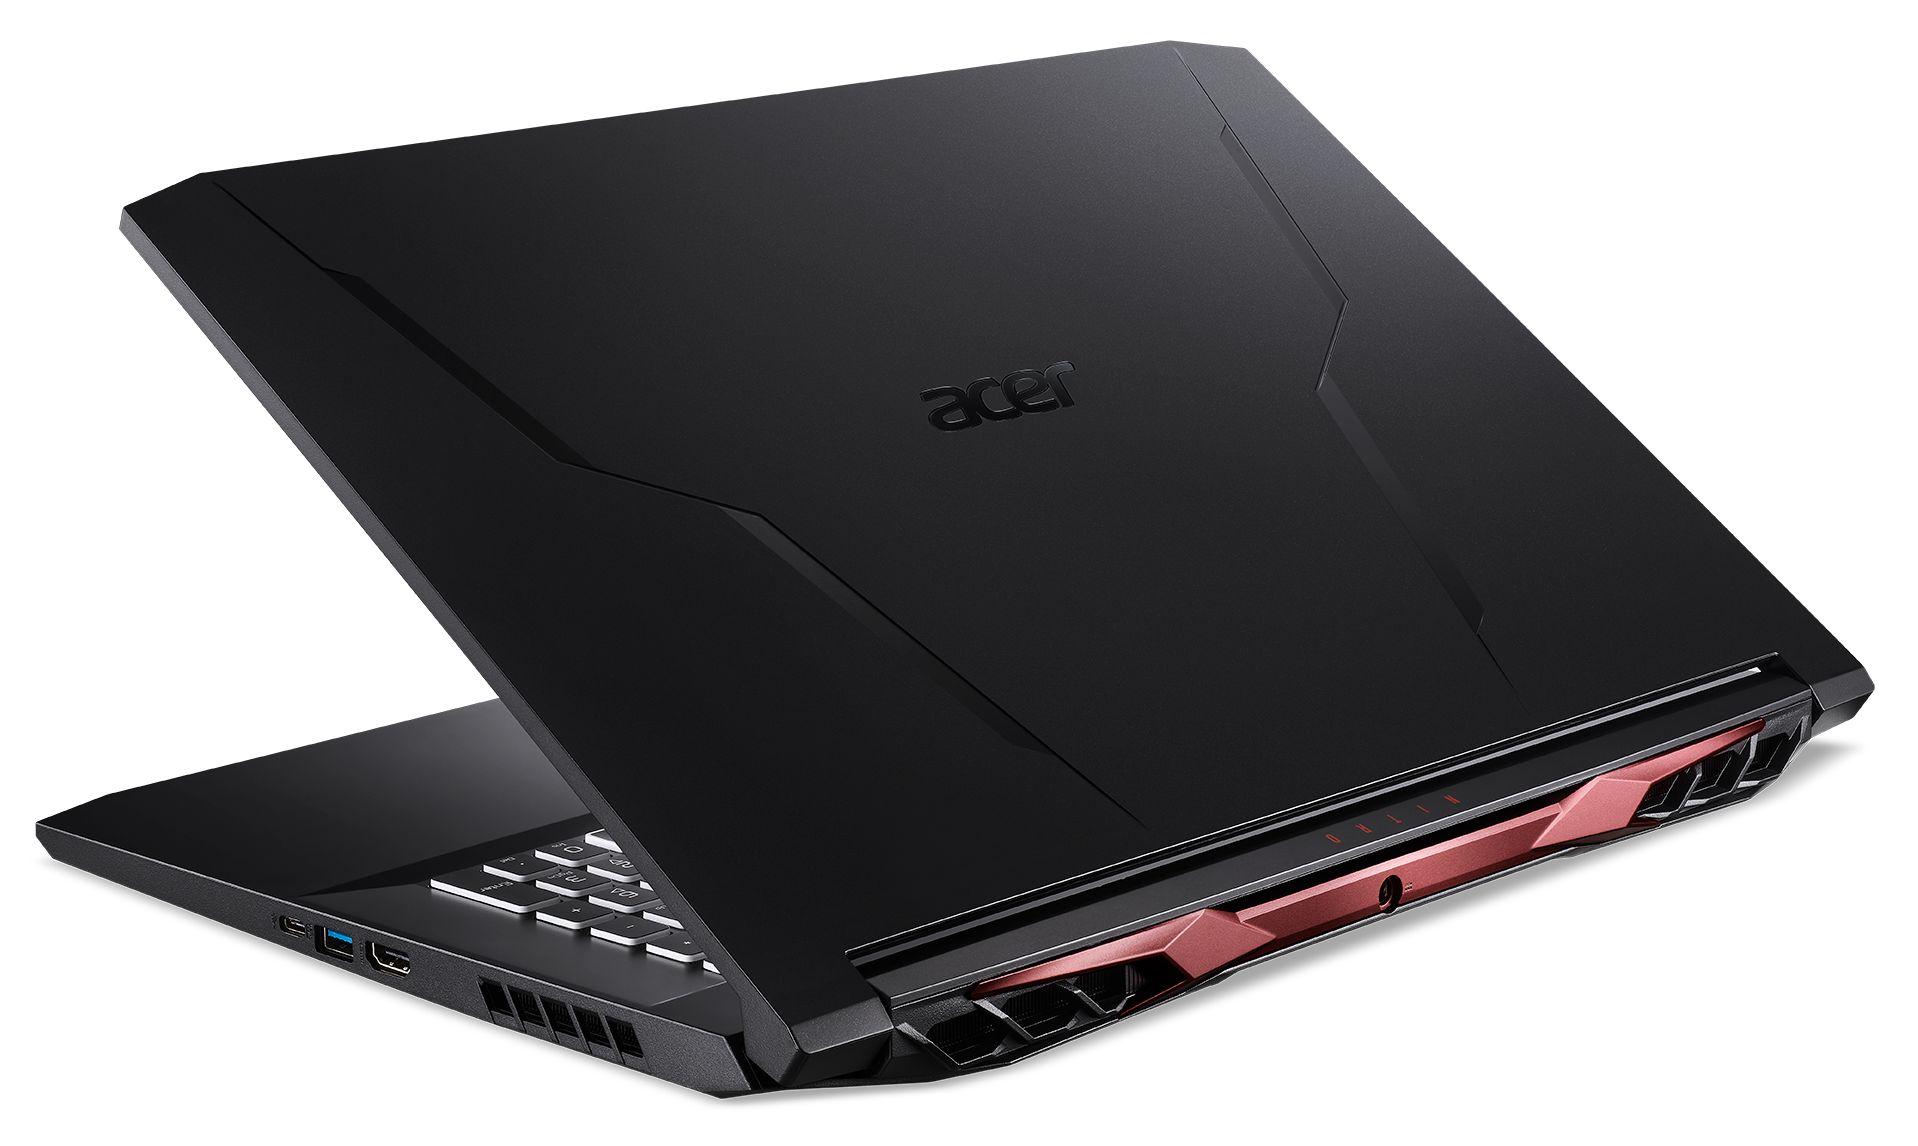 Nitro AN517-41-R74B - Noir